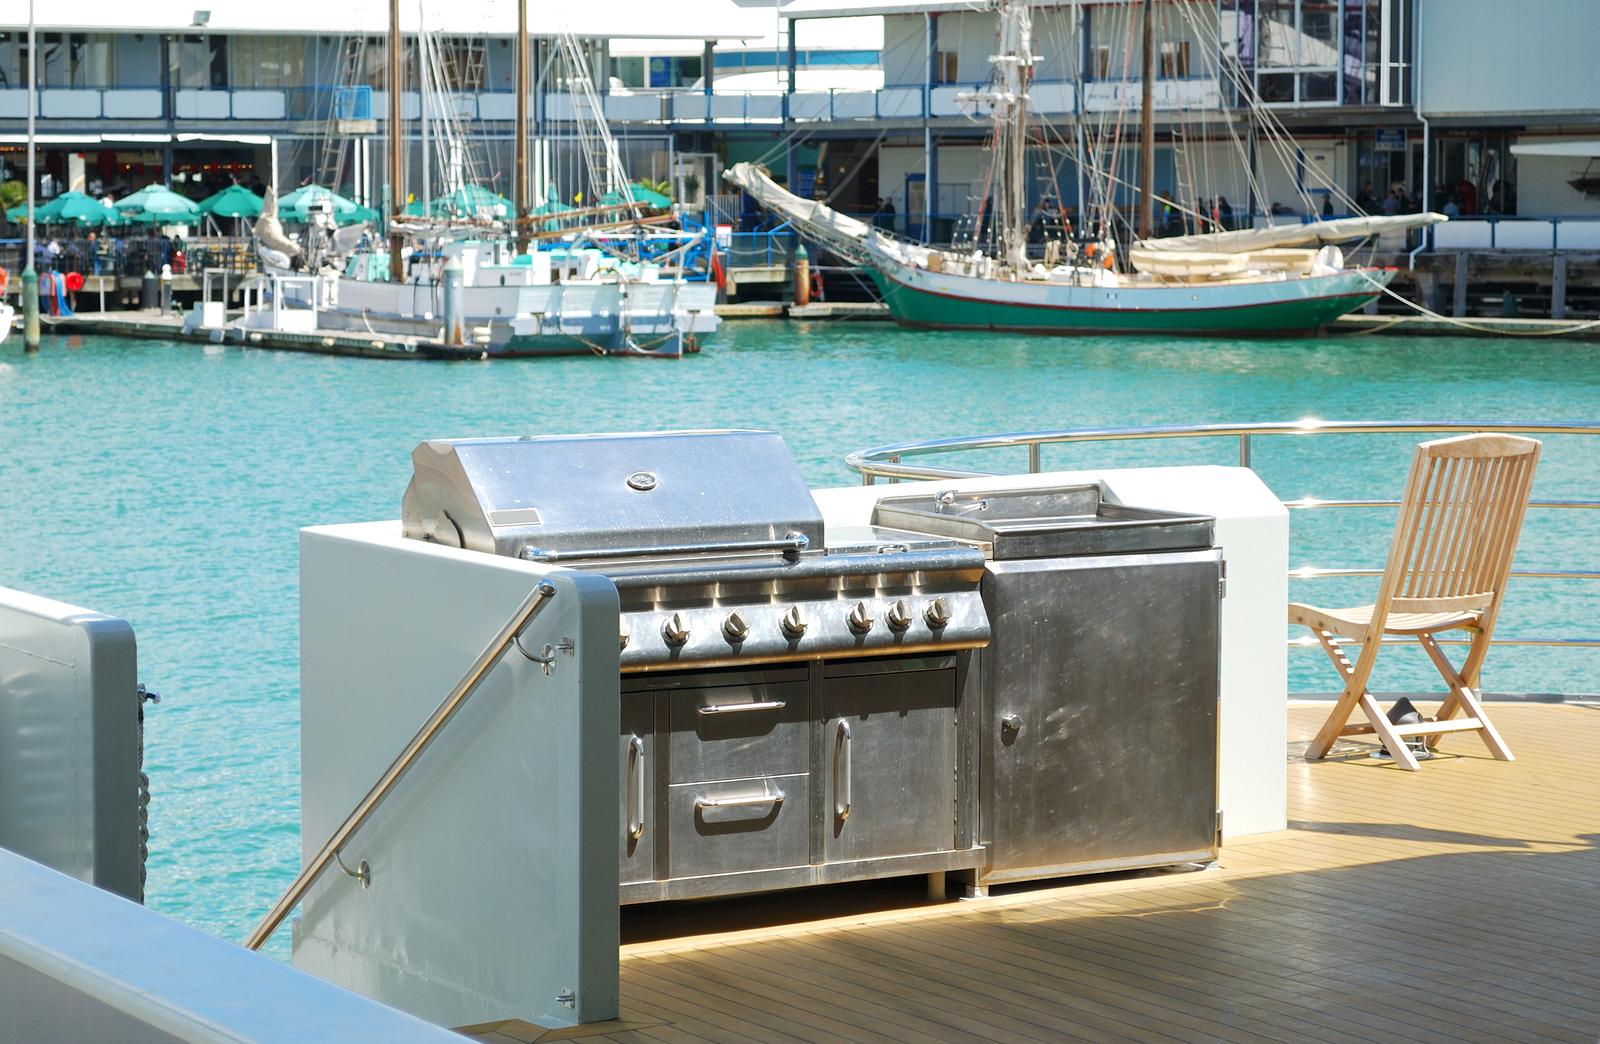 bigstock-luxury-gas-barbecue-on-the-sh-23598623.jpg